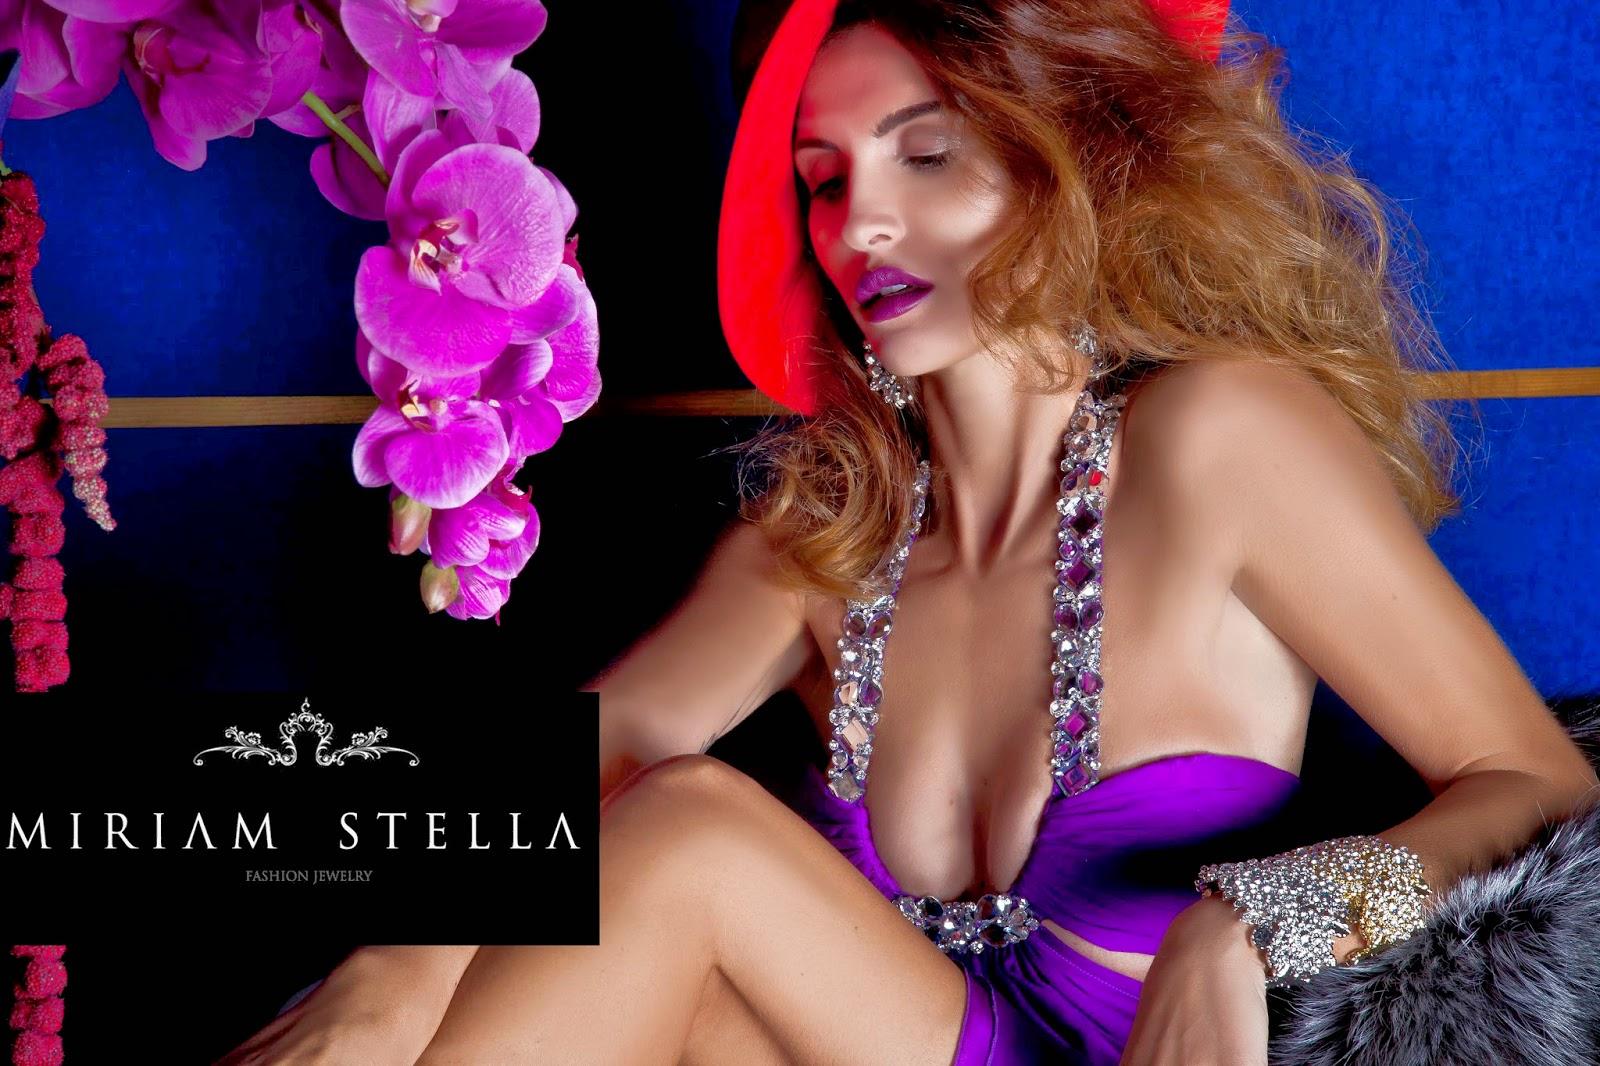 http://www.isfashionmypassion.com/2014/03/miriam-stella-adv-campaign.html